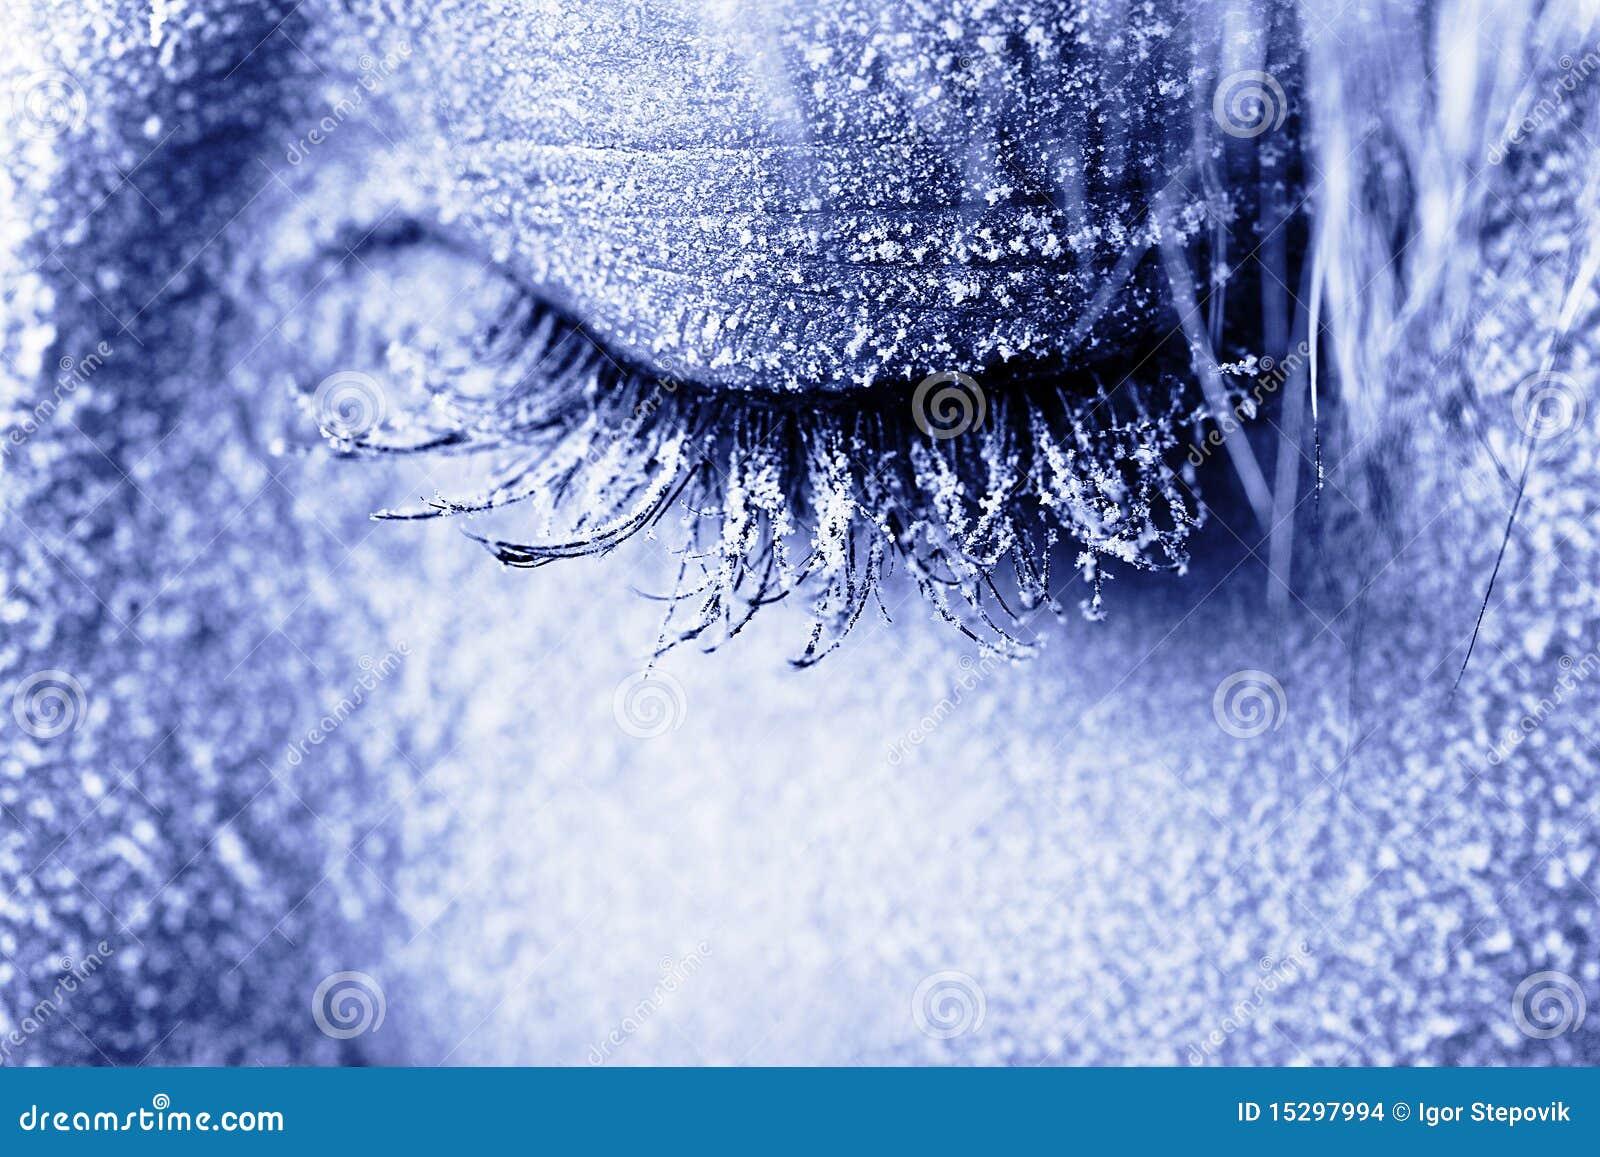 Räknad öga glaserad fryst s-kvinna